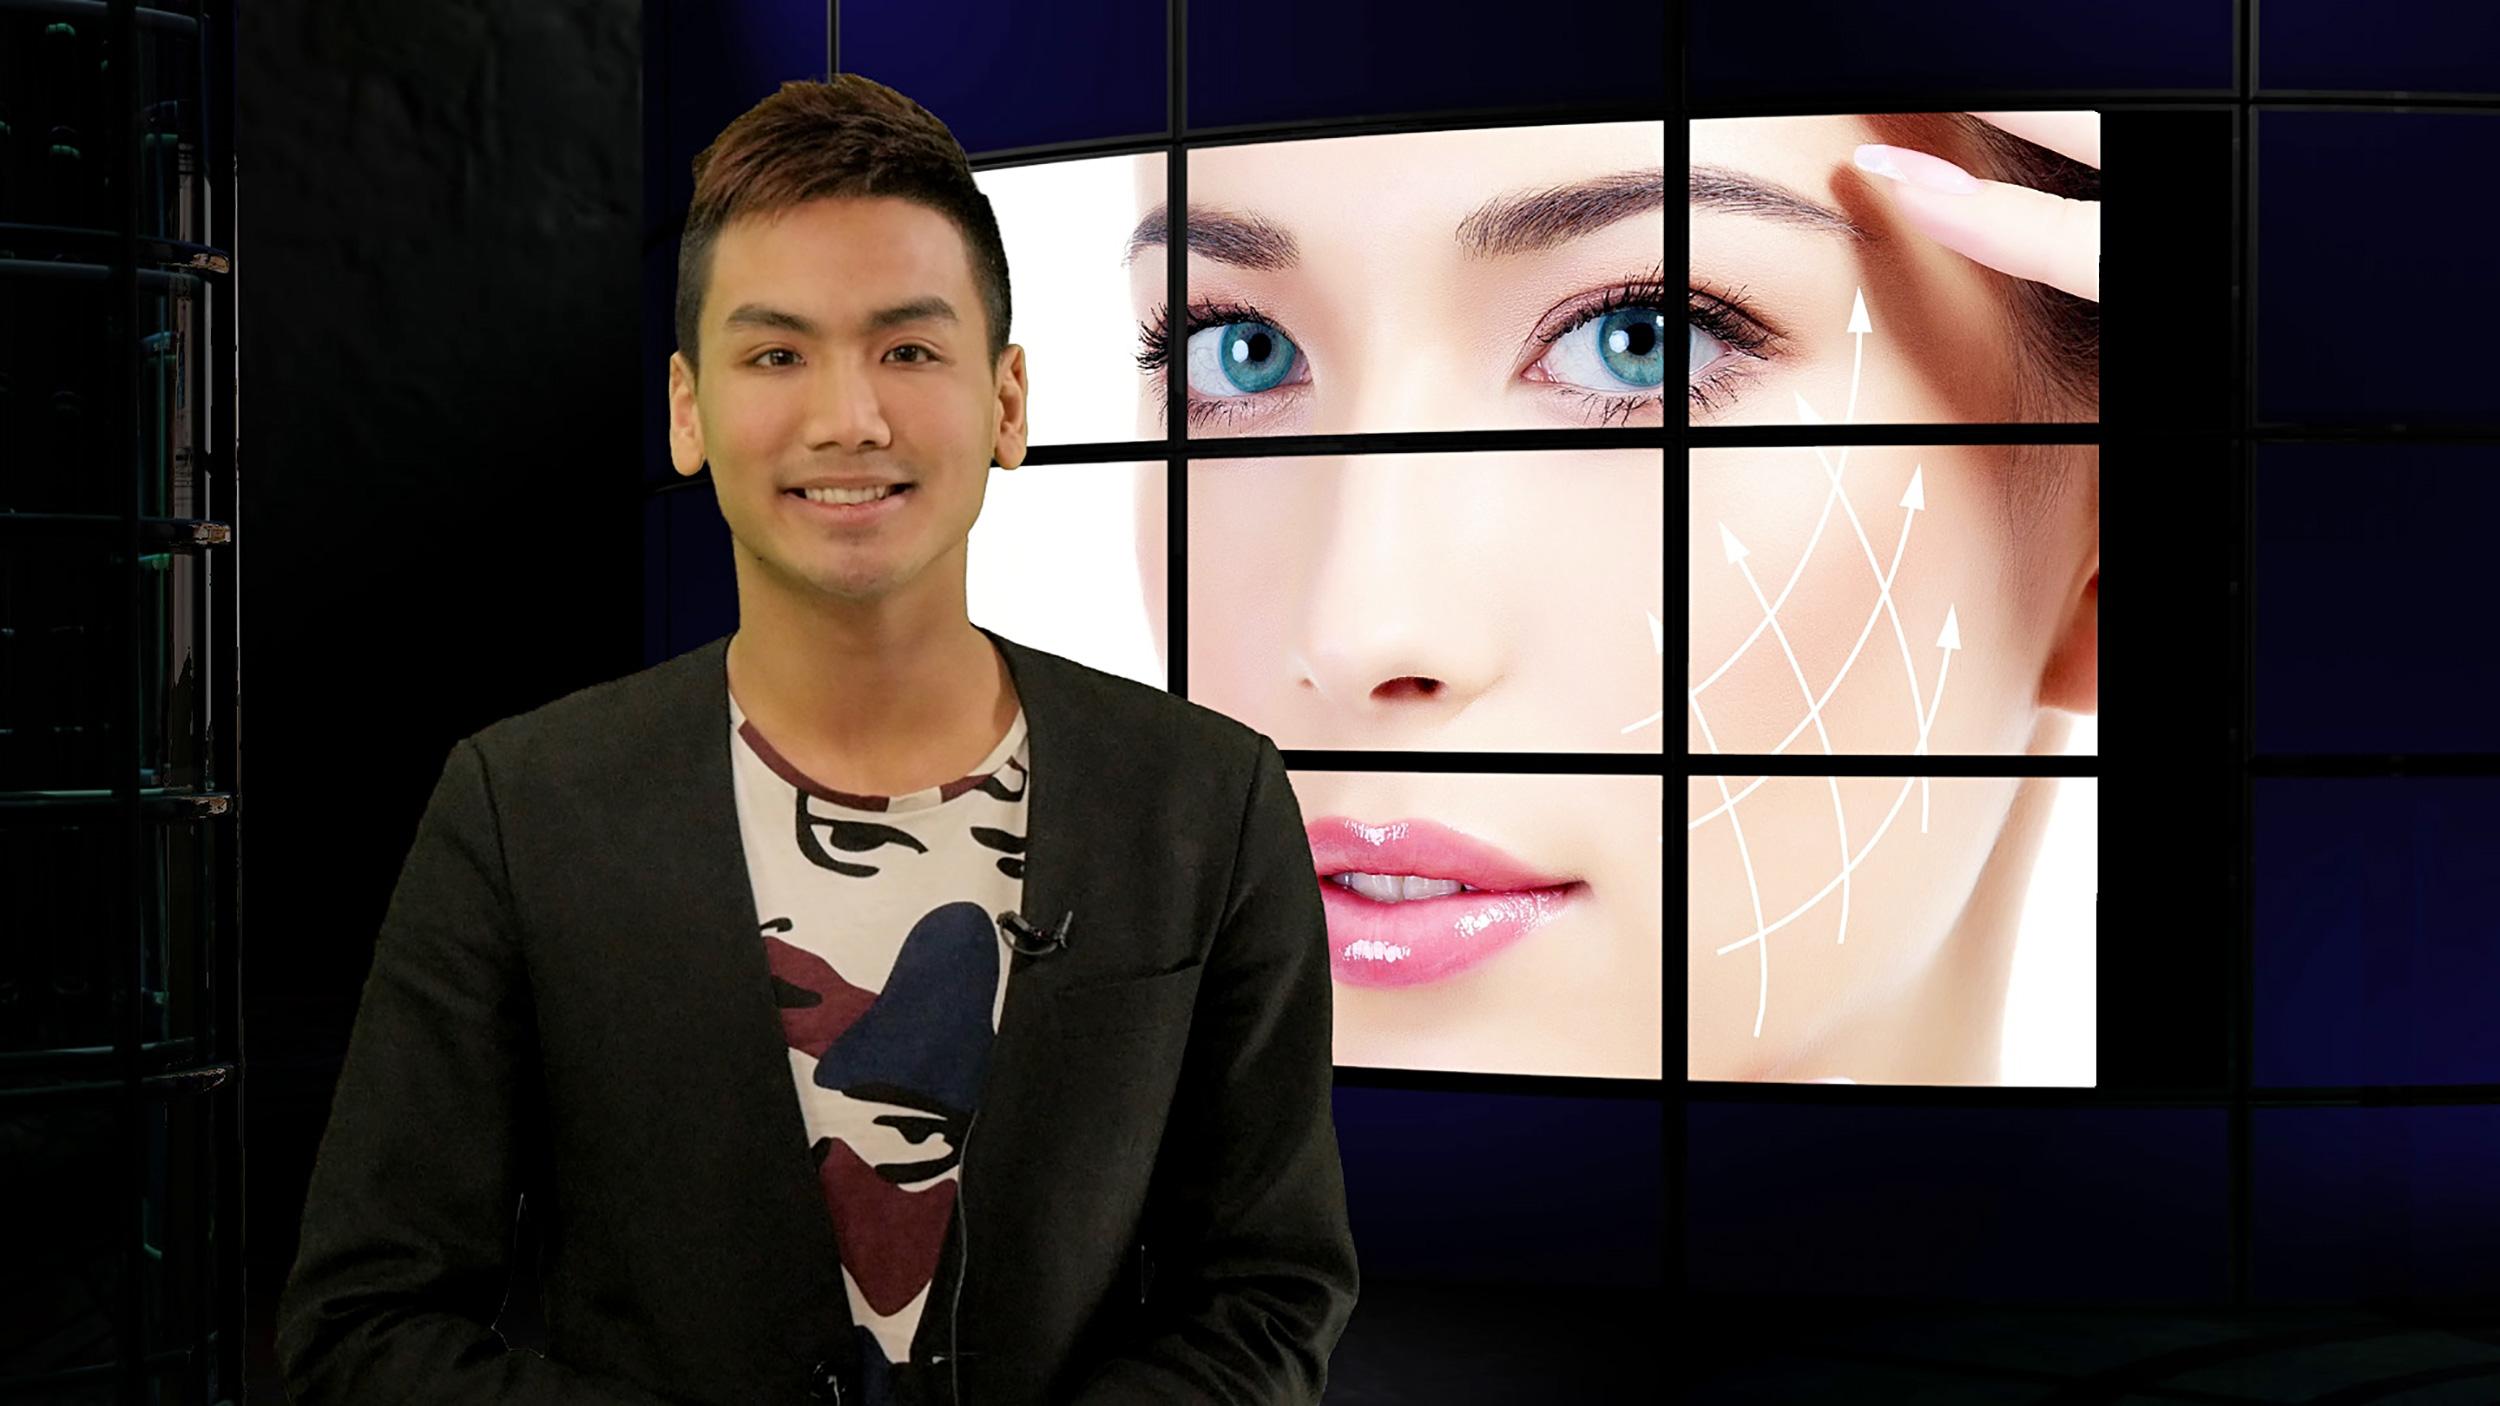 Piece to camera during TV presenter training